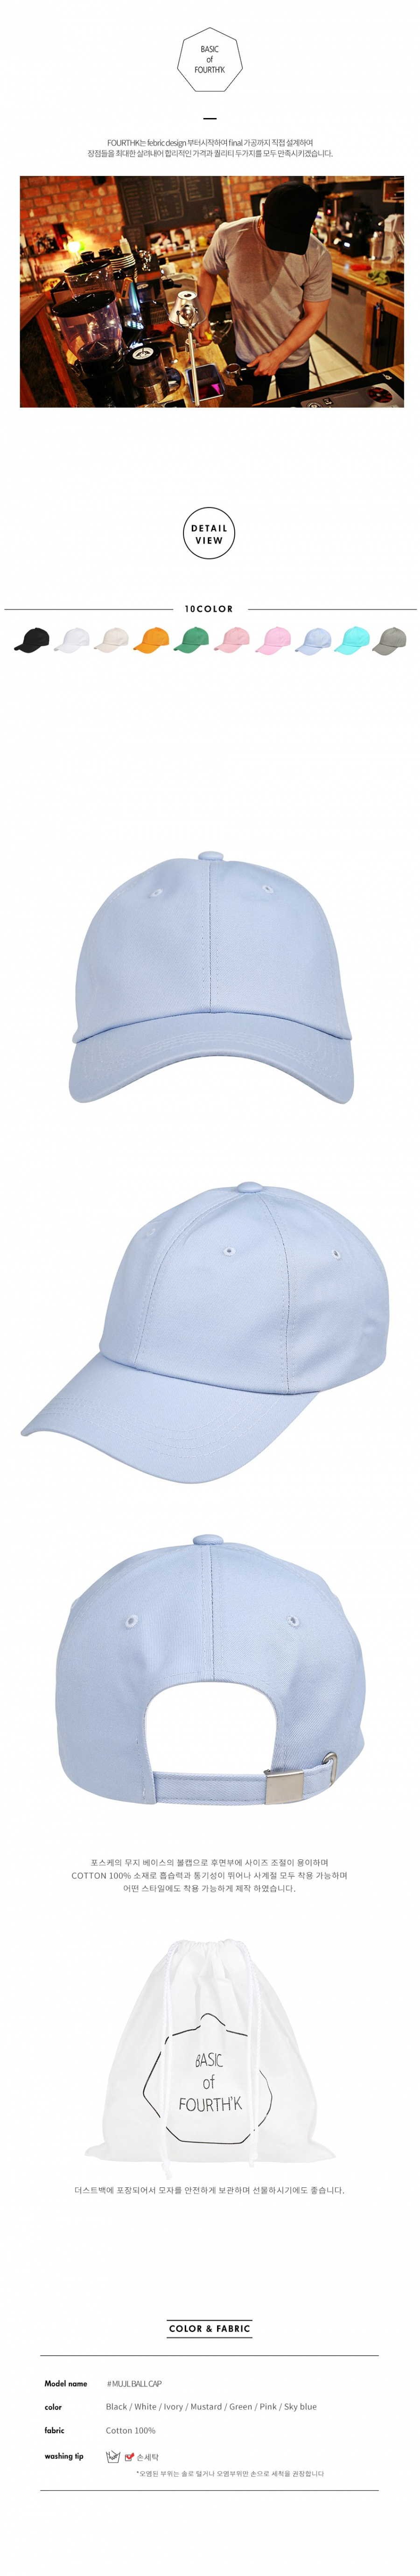 46435a27d5dca 포스케(FOURTHK)  MUJI BALL CAP Sky blue - 17